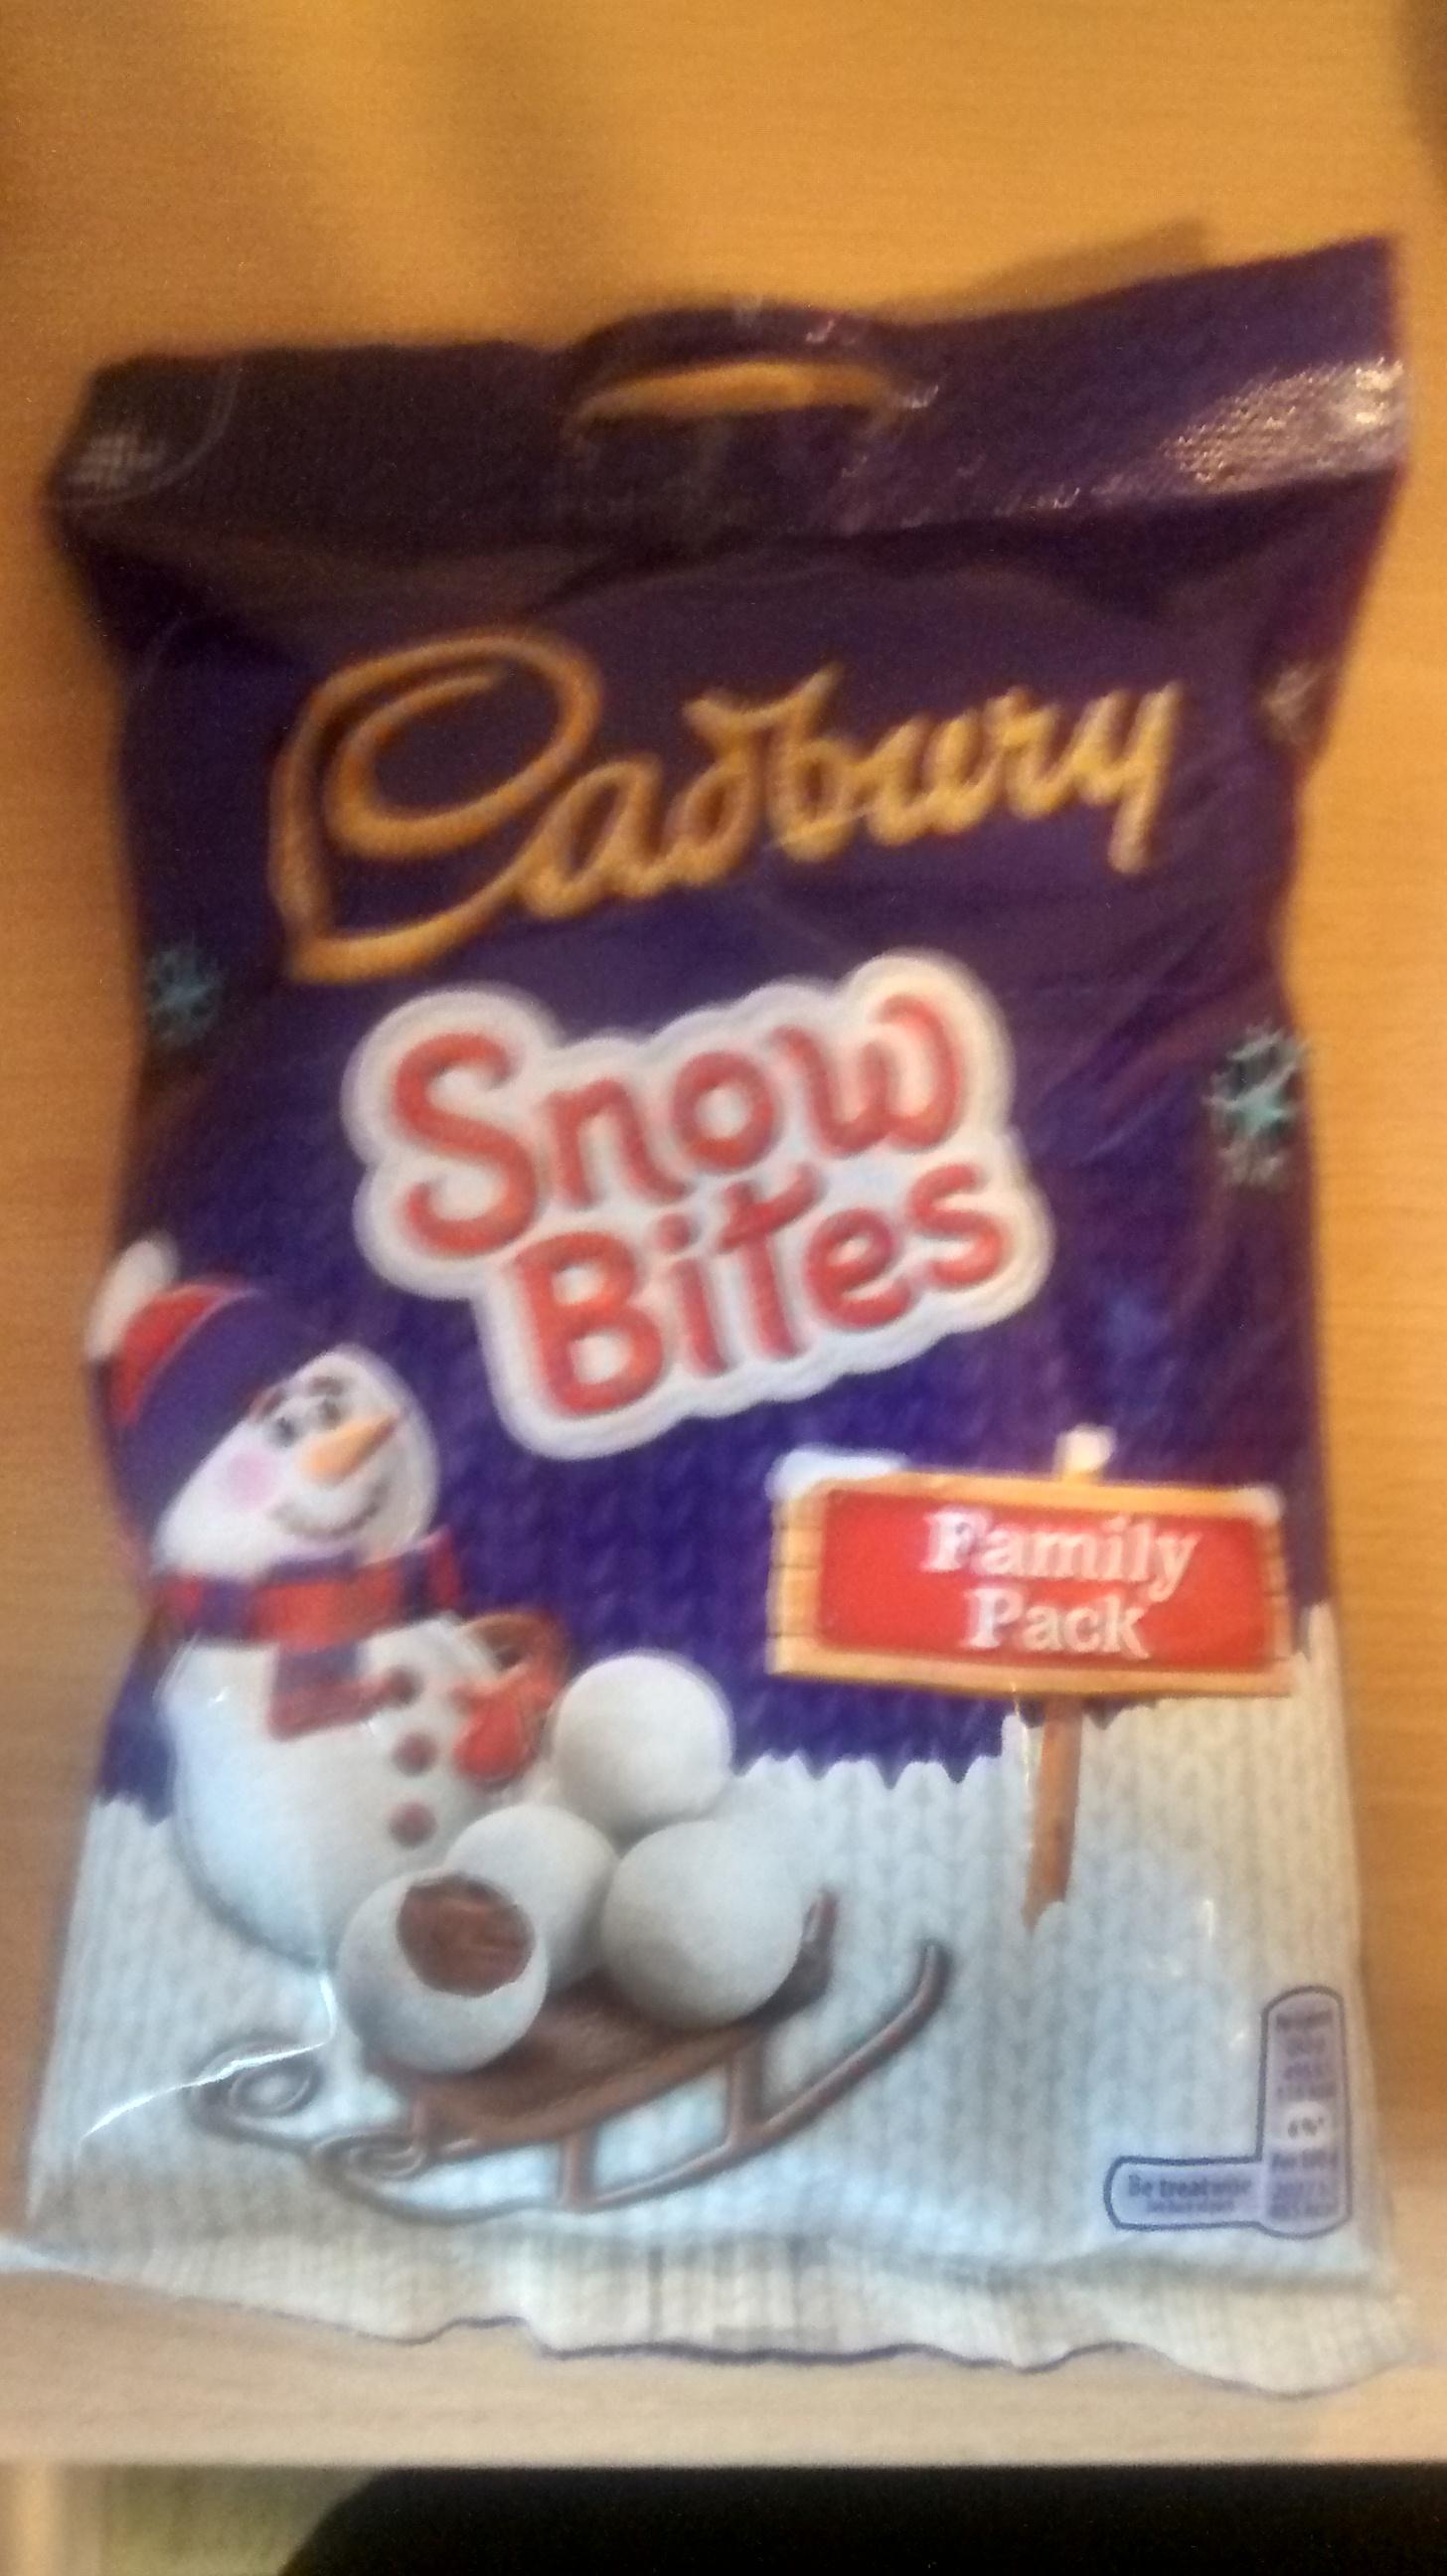 Cadbury Snow Bites Family Pack (329g) £1 in ASDA